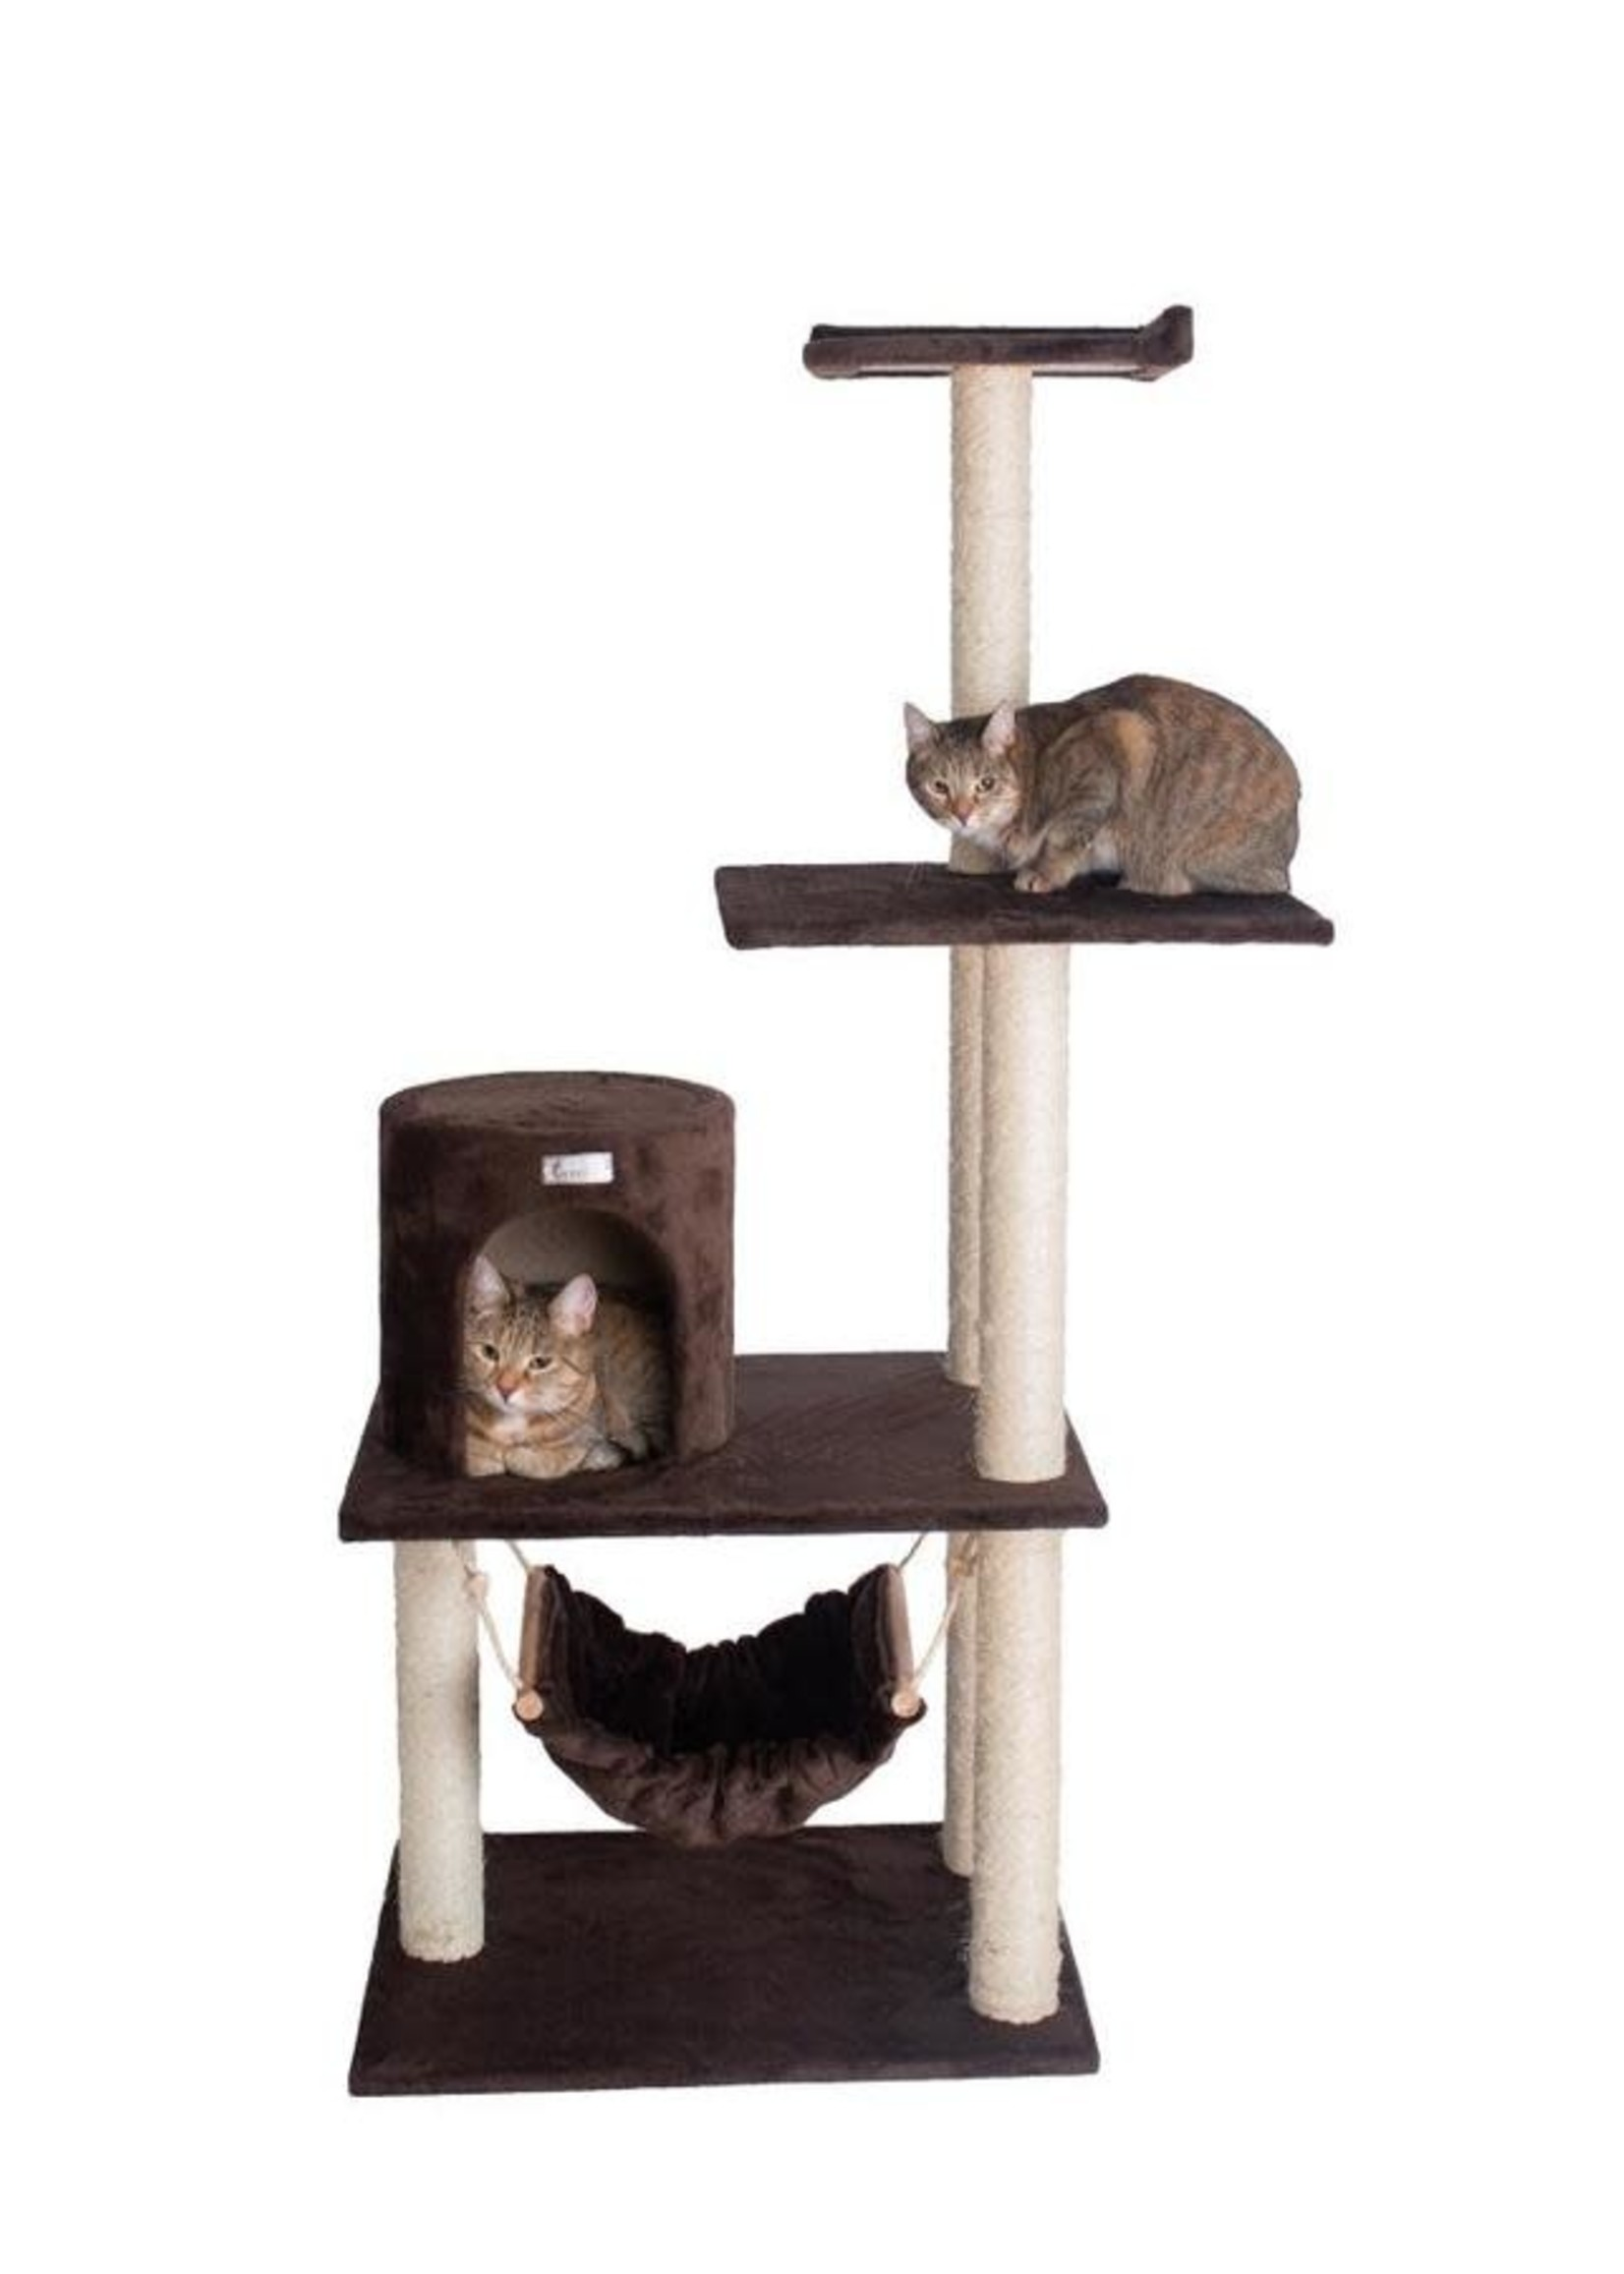 GleePet GleePet GP78590223 59-Inch Cat Tree In Coffee Brown With Condo And Hammock